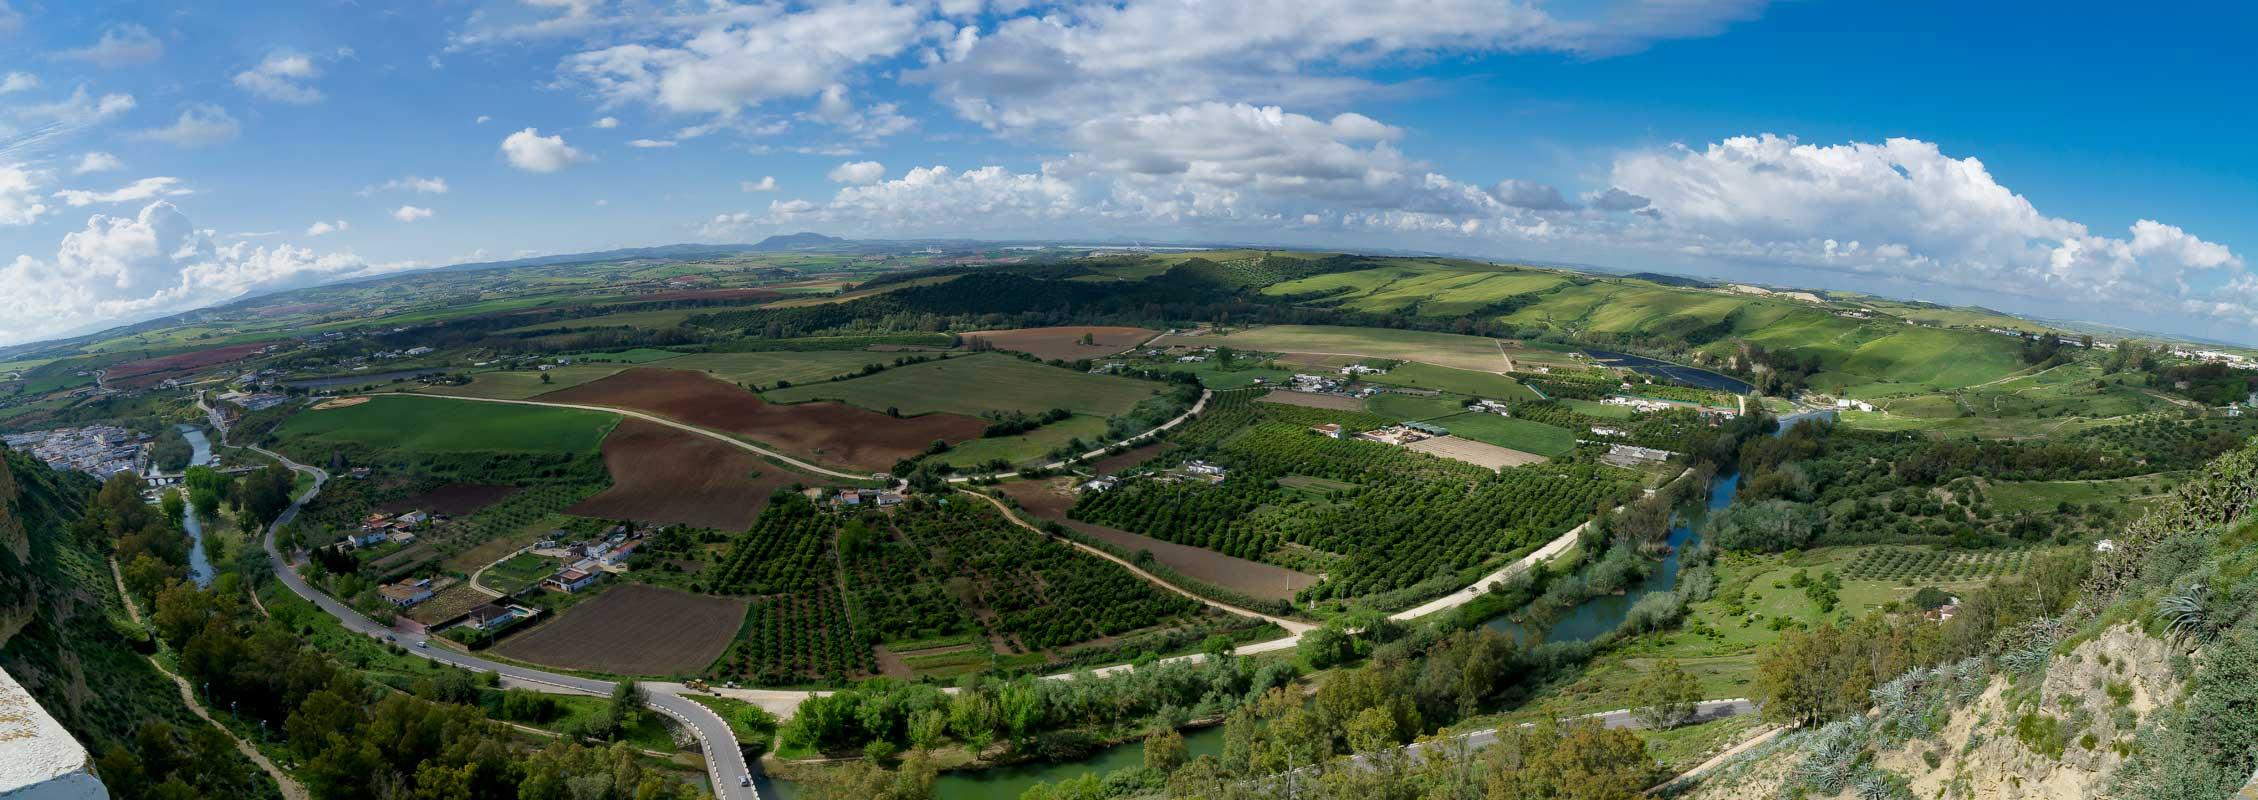 Долина реки Гвадалете, Аркос-де-ла-Фронтера | Guadalete Valley, Arcos de la Frontera